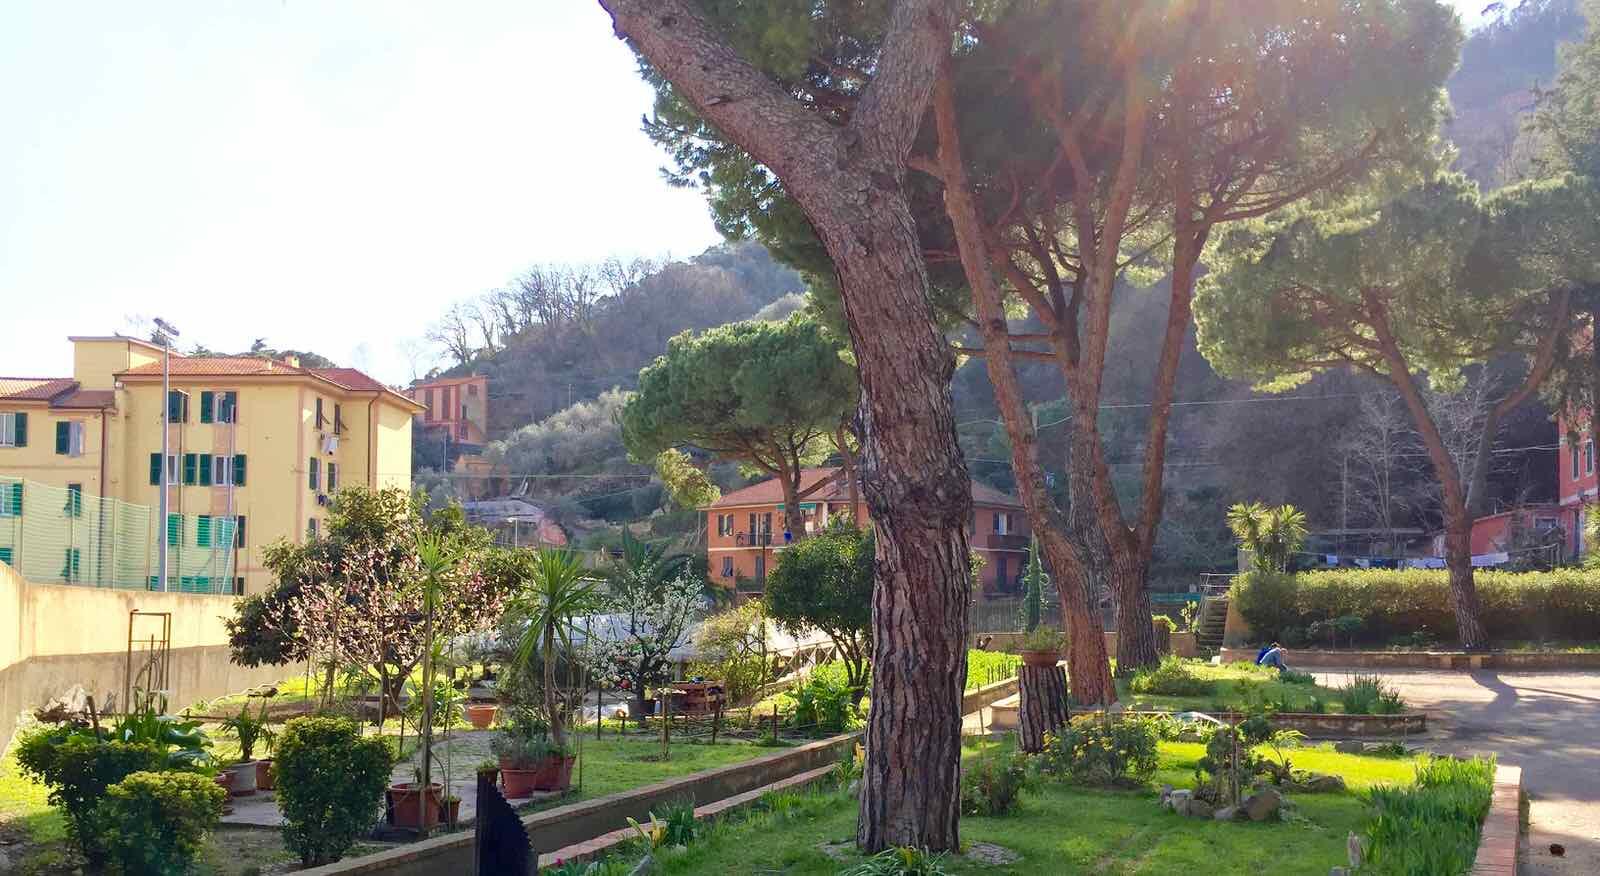 Centro Franco Chiarella - giardino 02